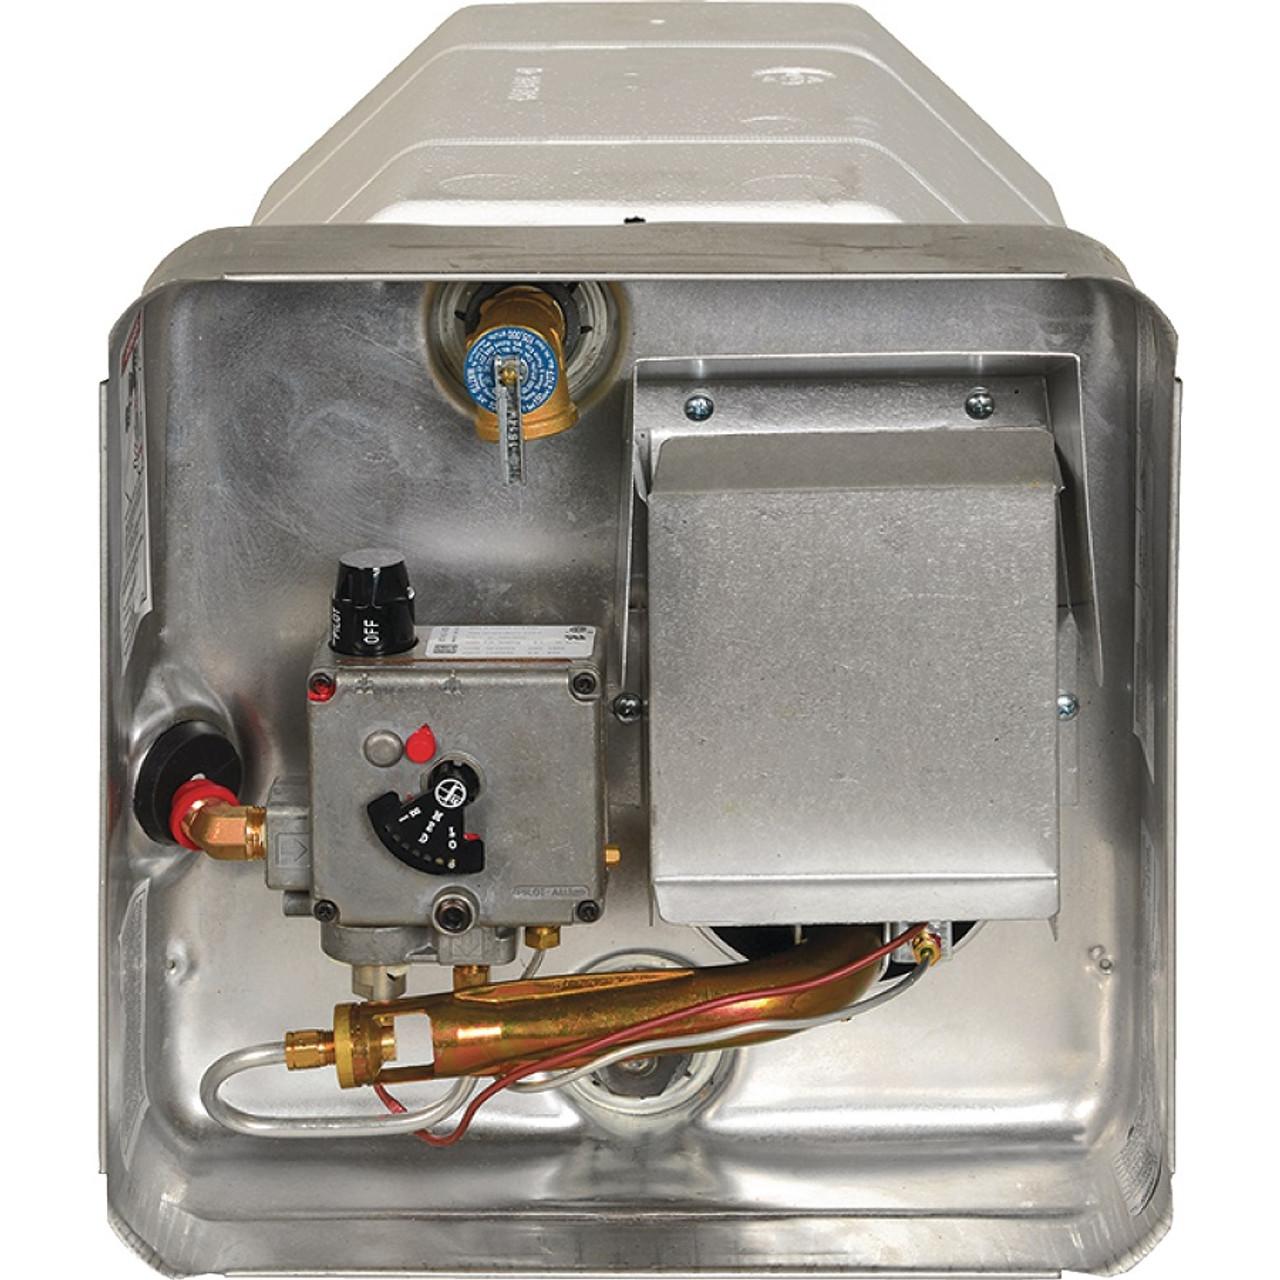 SUBURBAN WATER HEATER-10 GAL. GAS/PILOT (09-1005) Front View